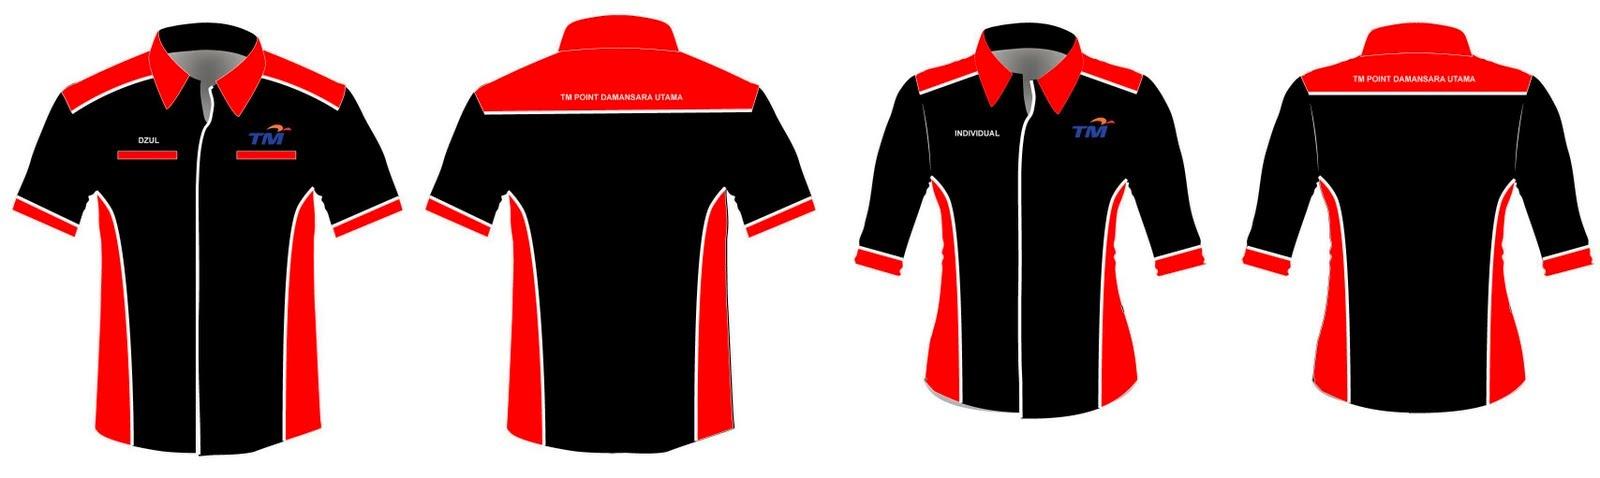 Design f1 shirt customade creeper design for Office design kz